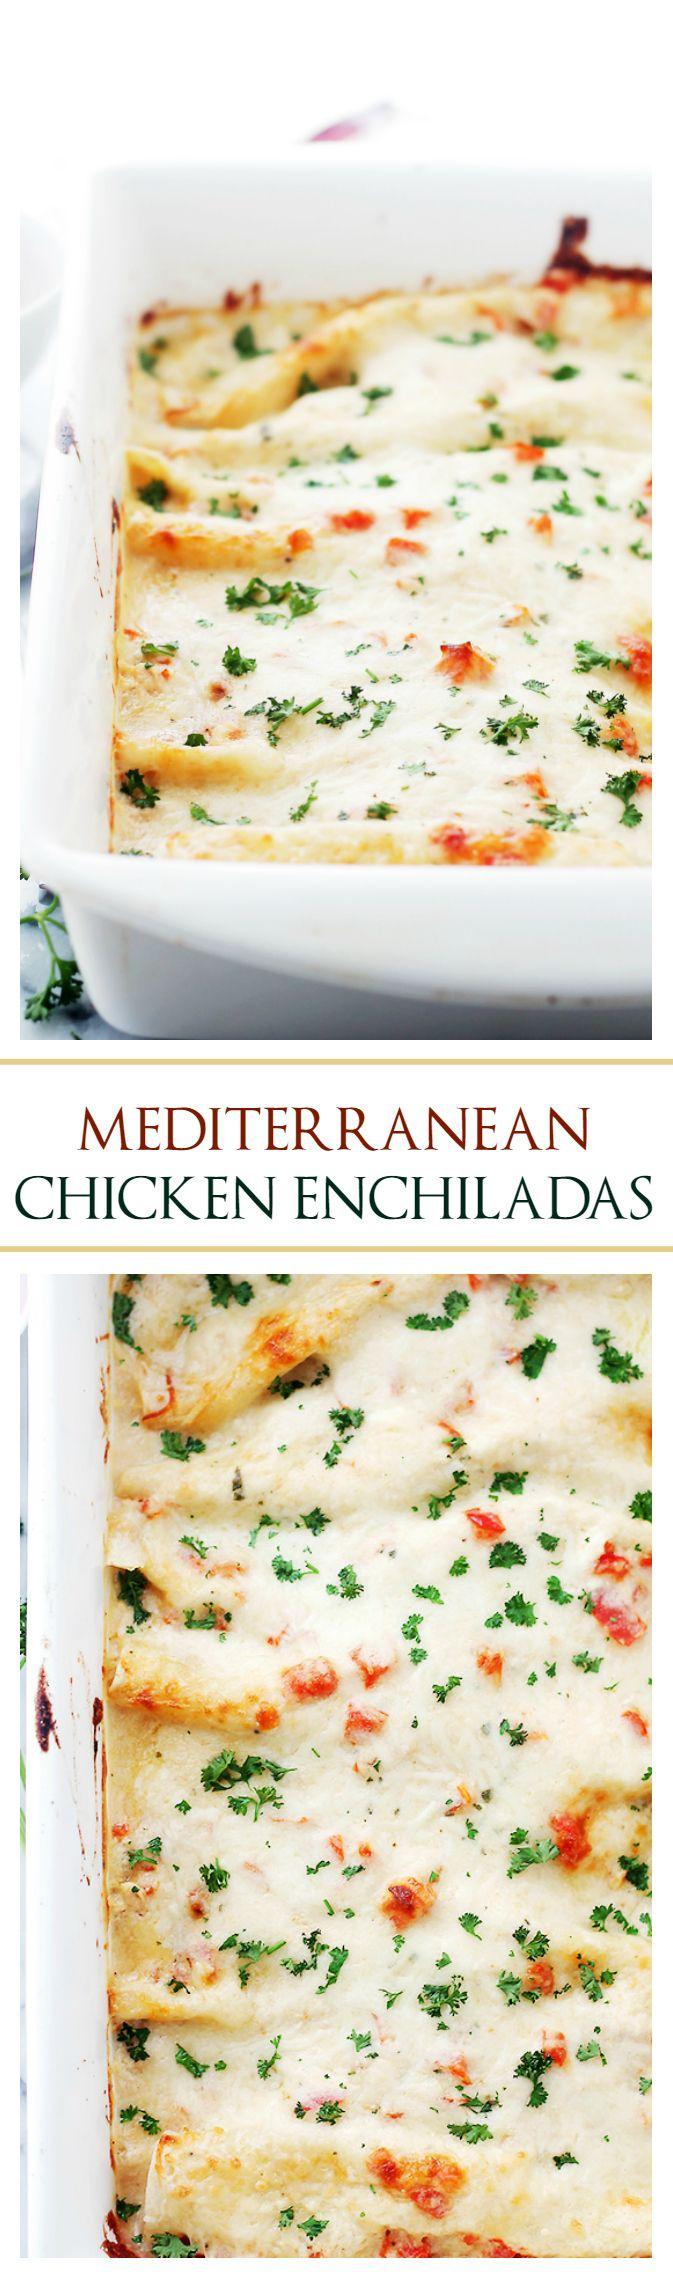 Mediterranean White Chicken Enchiladas | www.diethood.com | Amazing Chicken Enchiladas with creamy yogurt sauce, red bell peppers and Italian Cheeses! The best Enchiladas I have ever made!